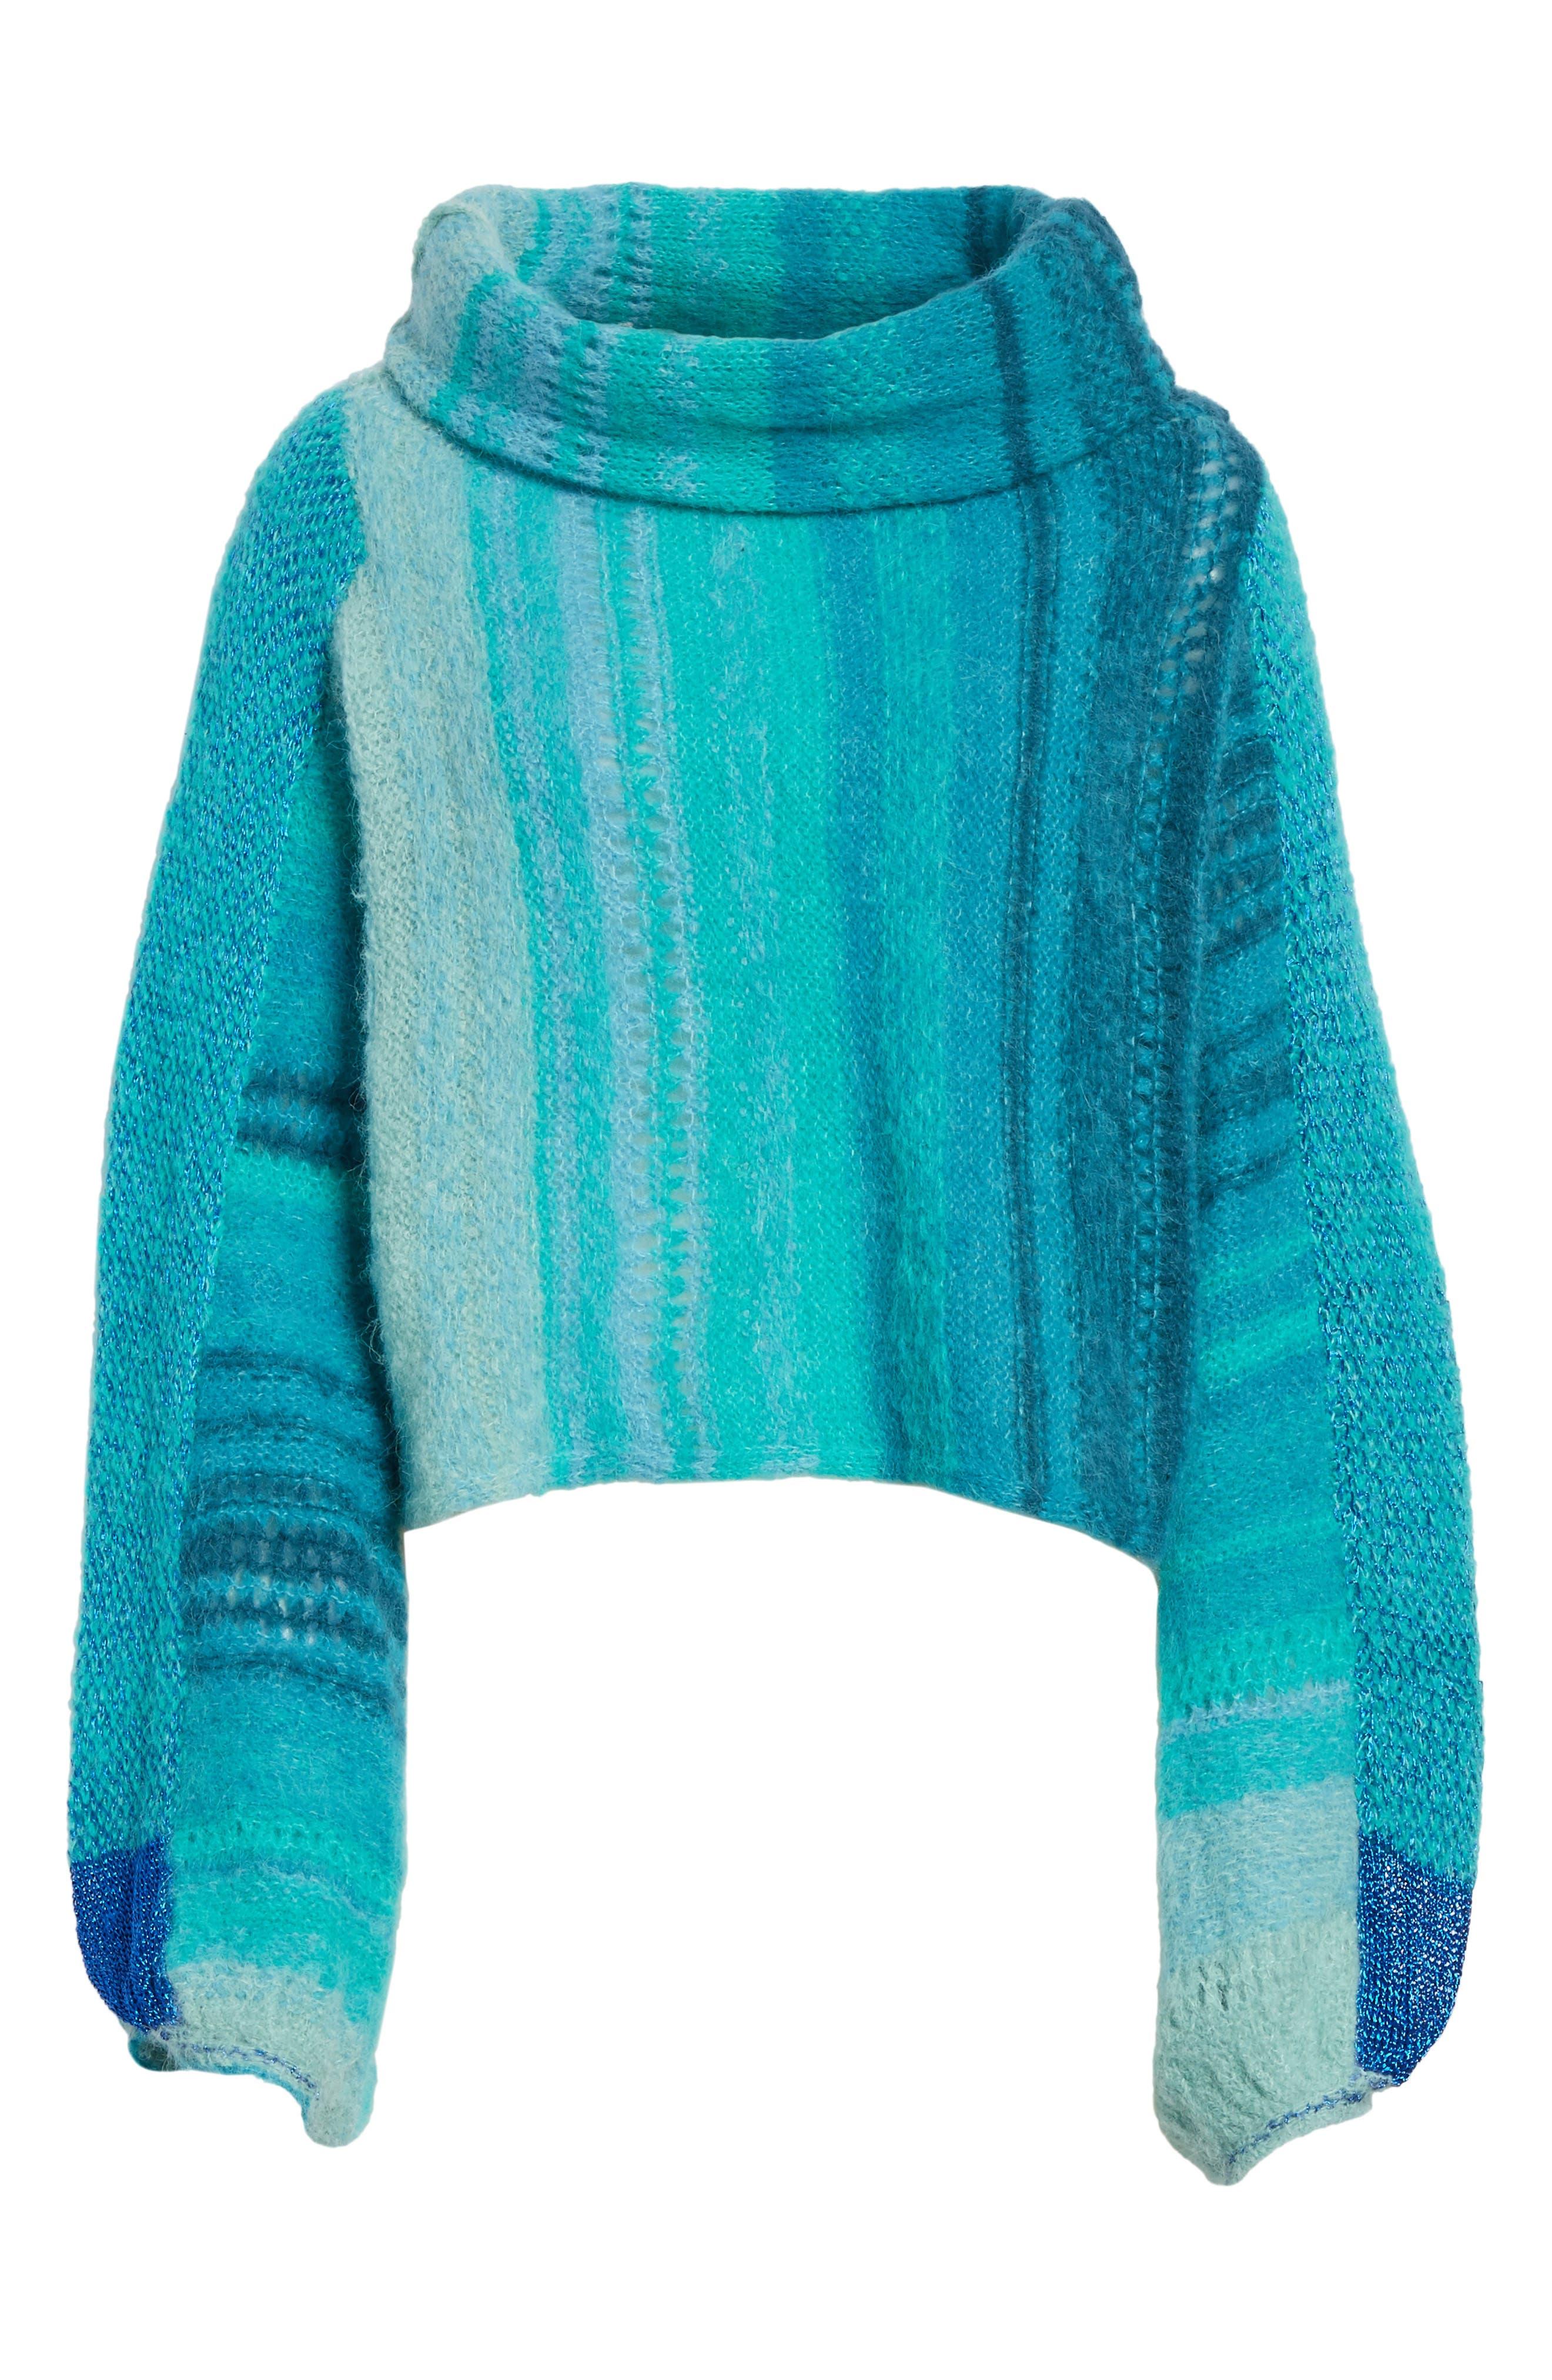 Cloud Kicker Sweater,                             Alternate thumbnail 6, color,                             Blue Combo